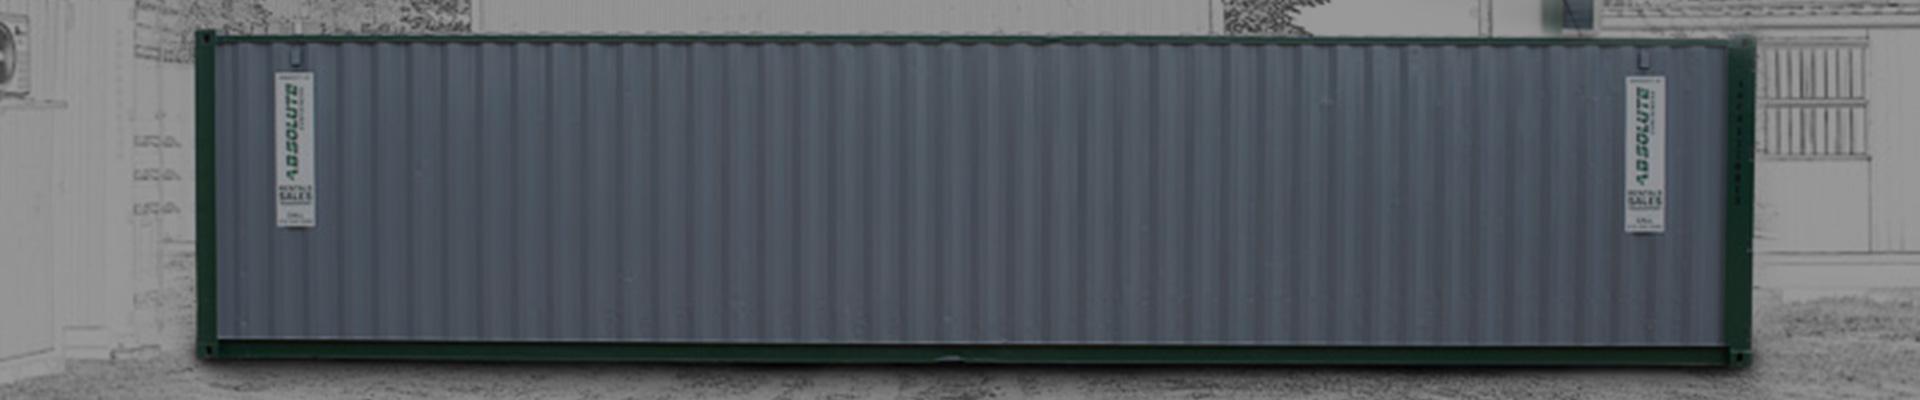 12m Storage Container